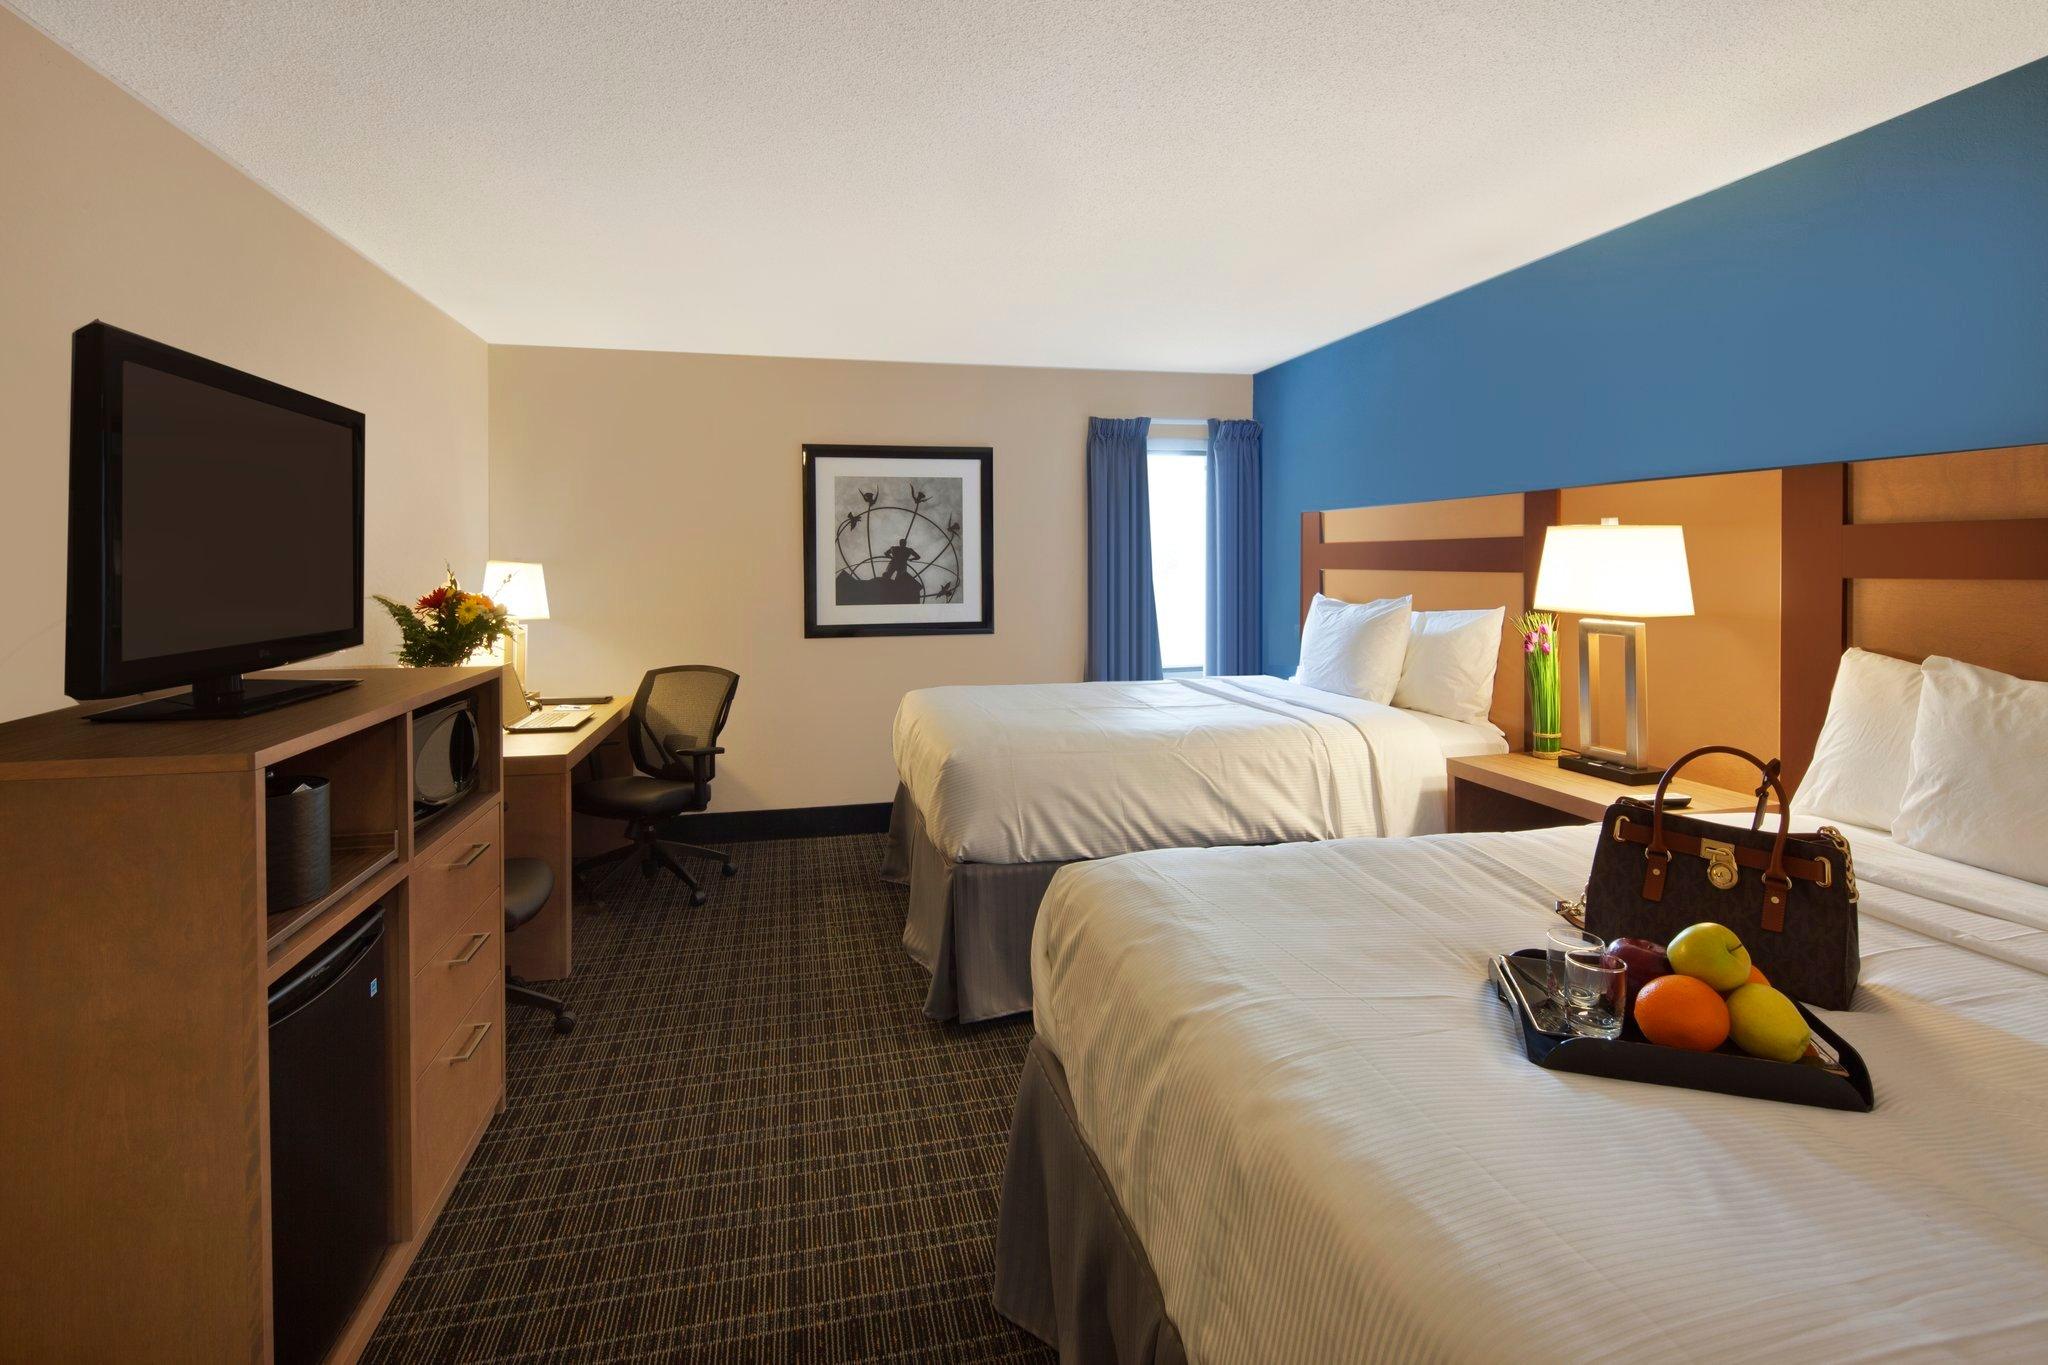 Canadas Best Value Inn Toronto Hotel Canada voir les tarifs et